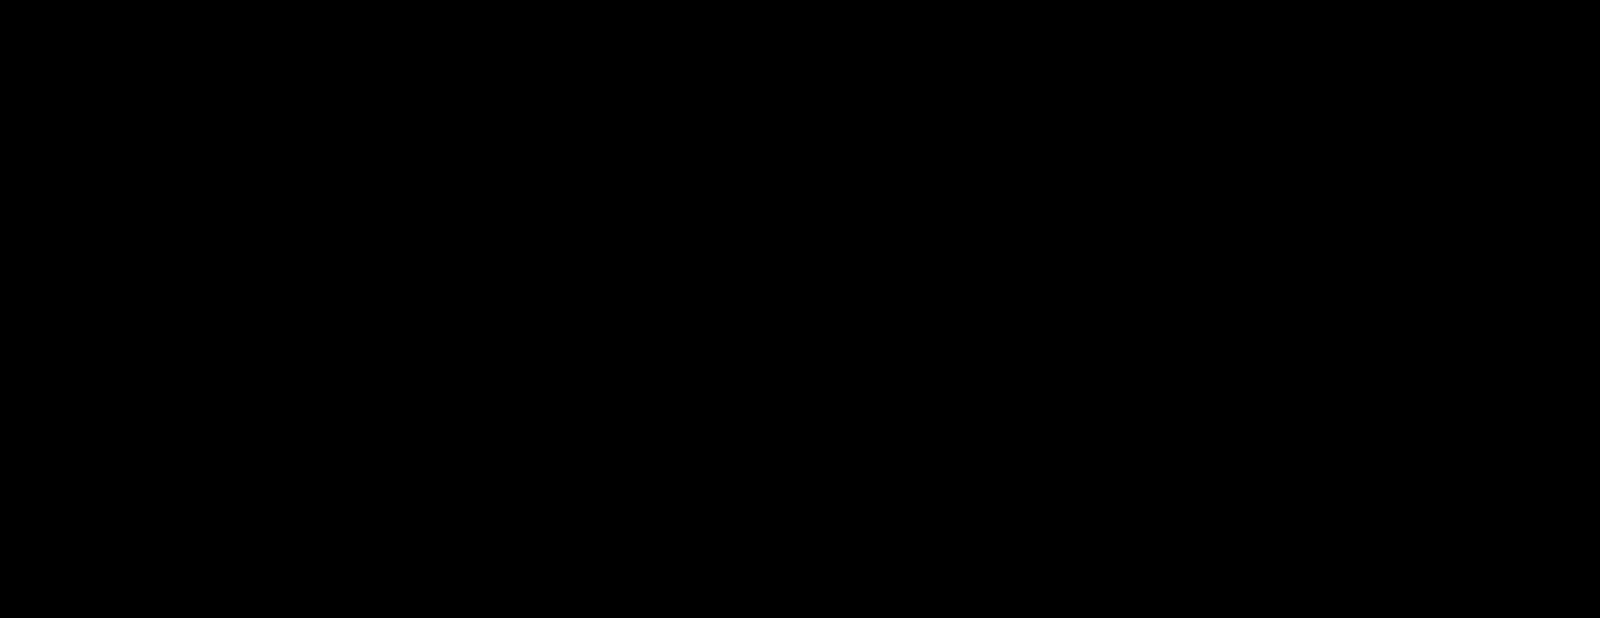 image02.png